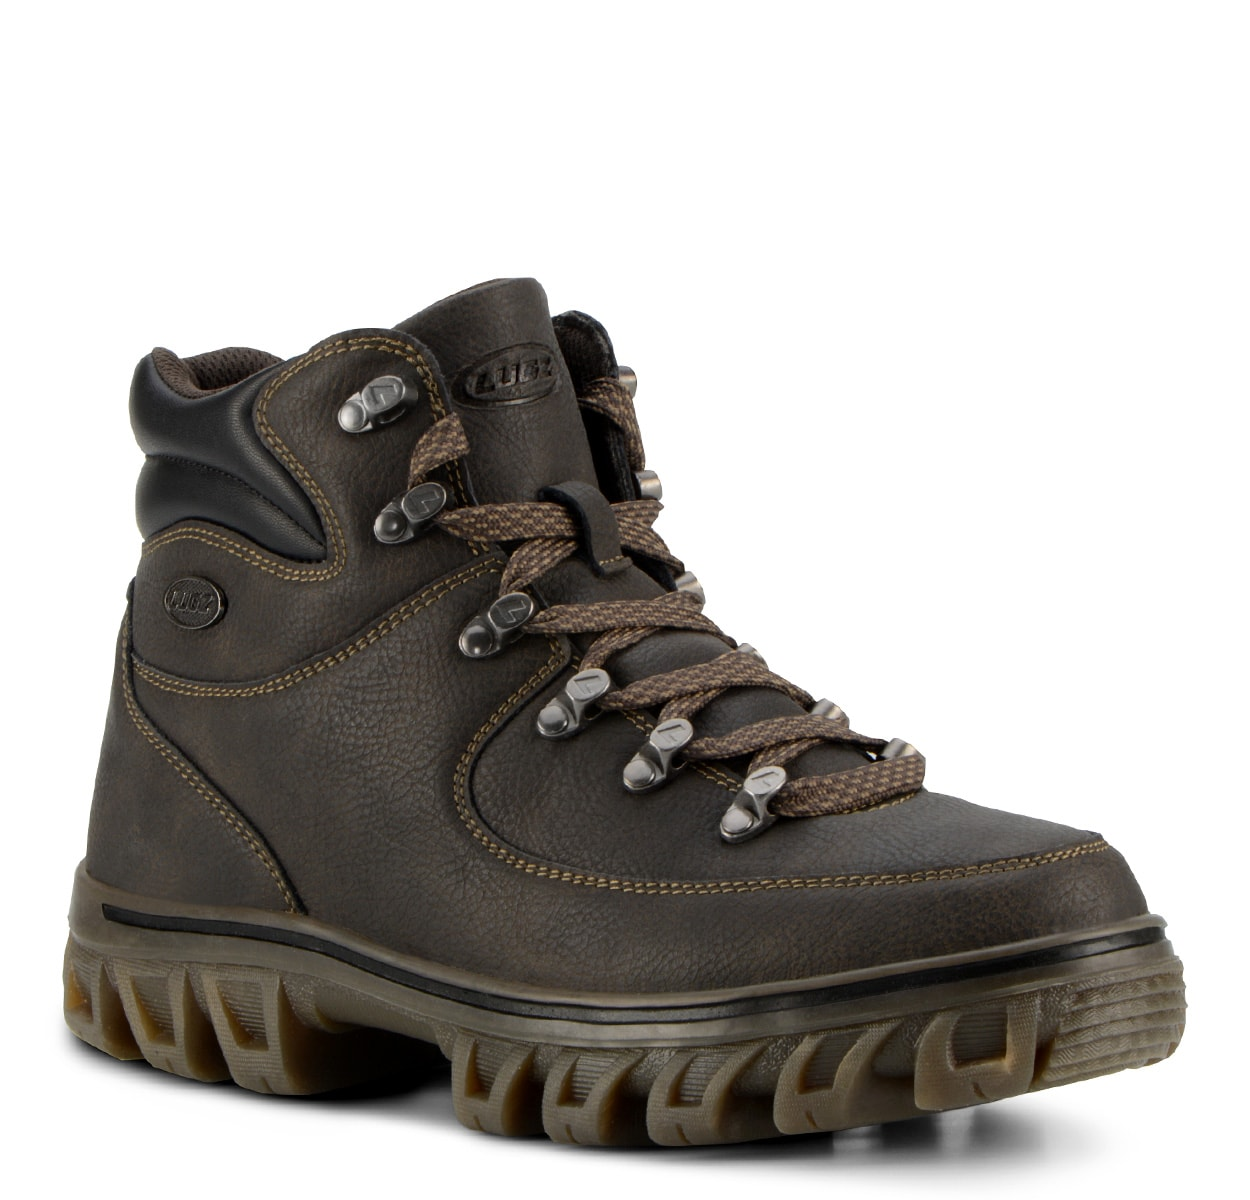 Men's Colorado Chukka Boot (Choose Your Color: DK BROWN/BLACK/NICOTINE GUM, Choose Your Size: 13.0)